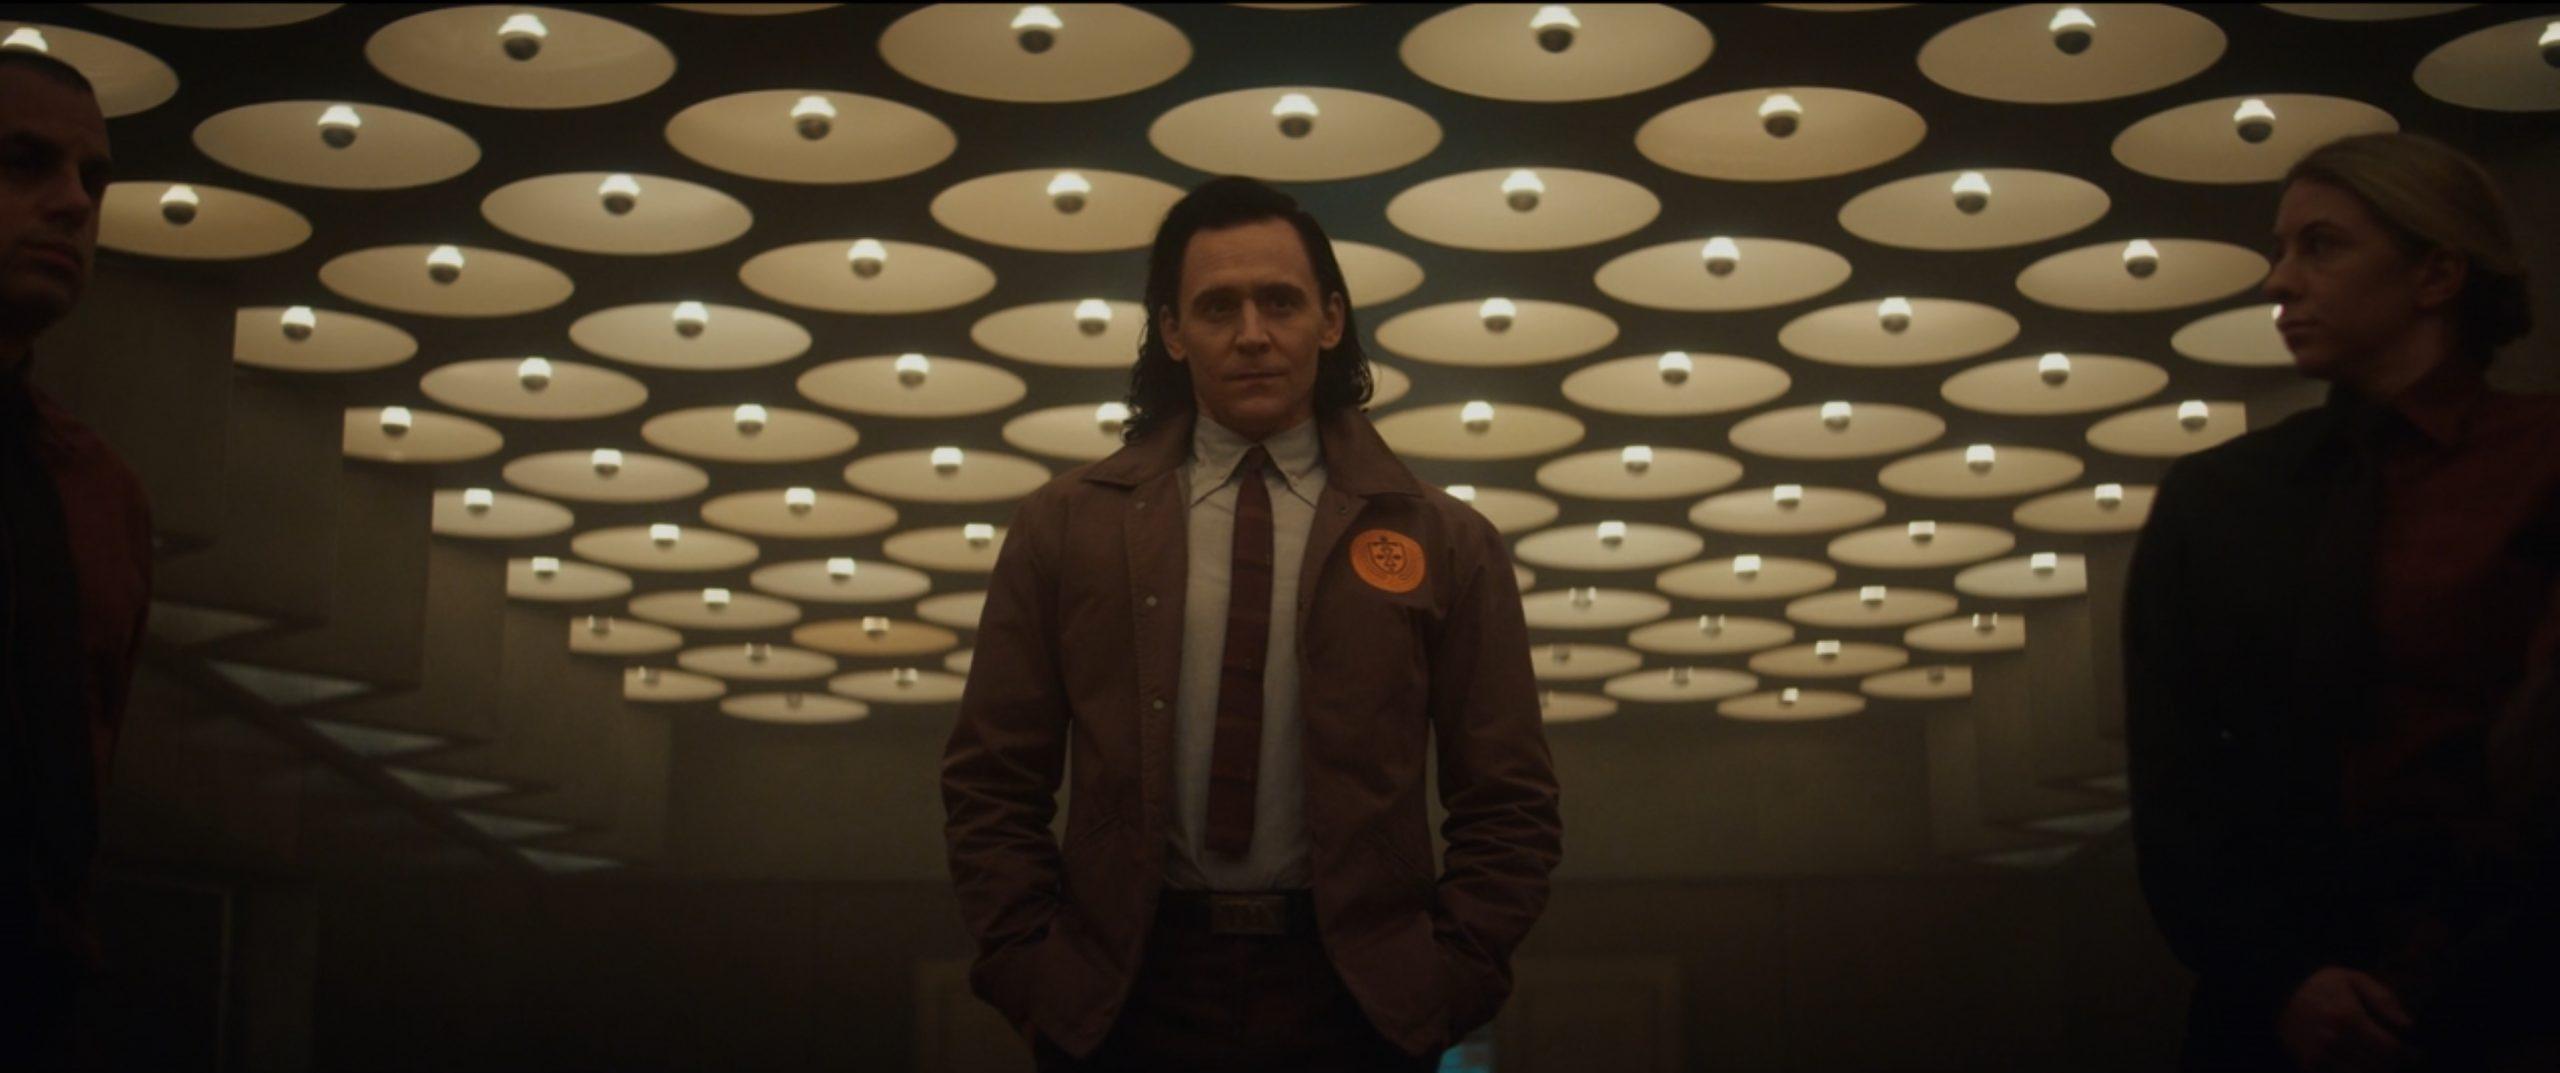 easter egg del secondo episodio di Loki - loki jacket